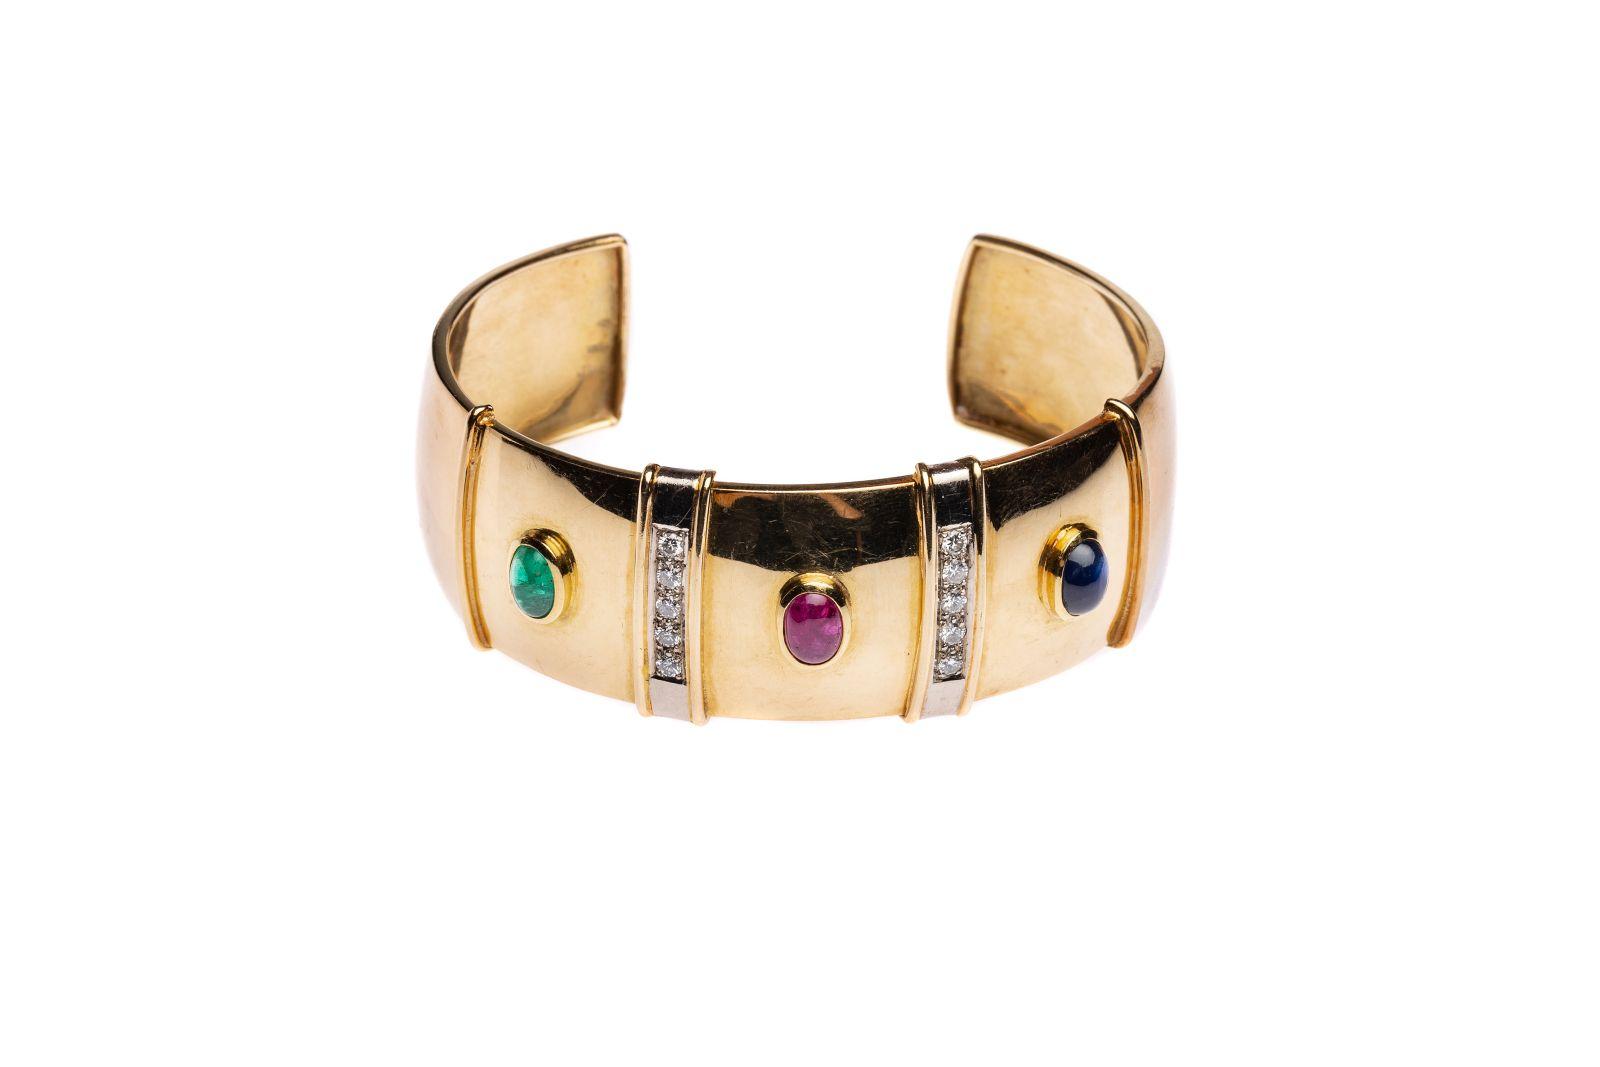 #137 Bracelet | Armspange Image